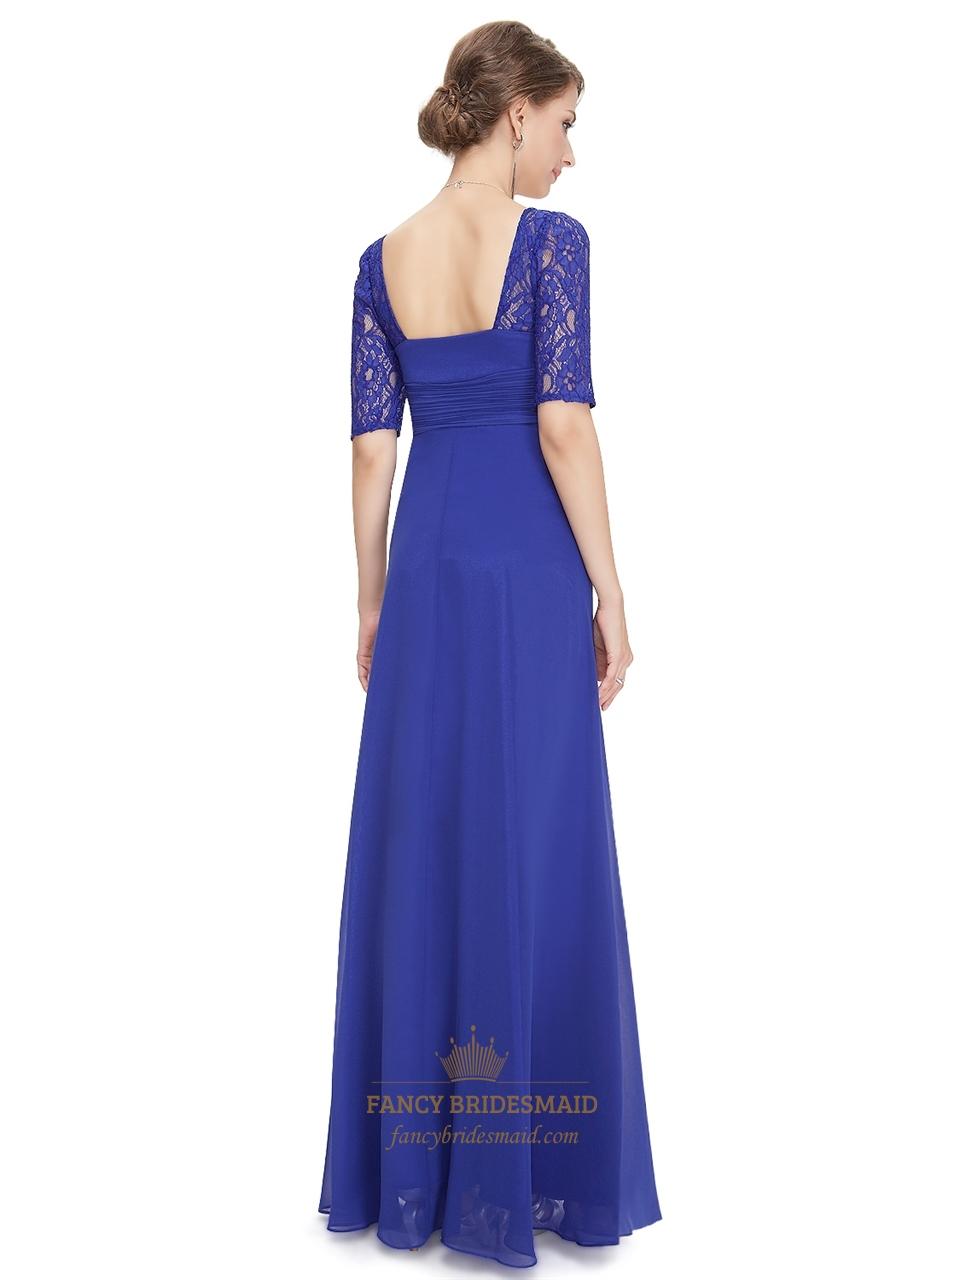 royal blue chiffon party wedding bridesmaid dress with